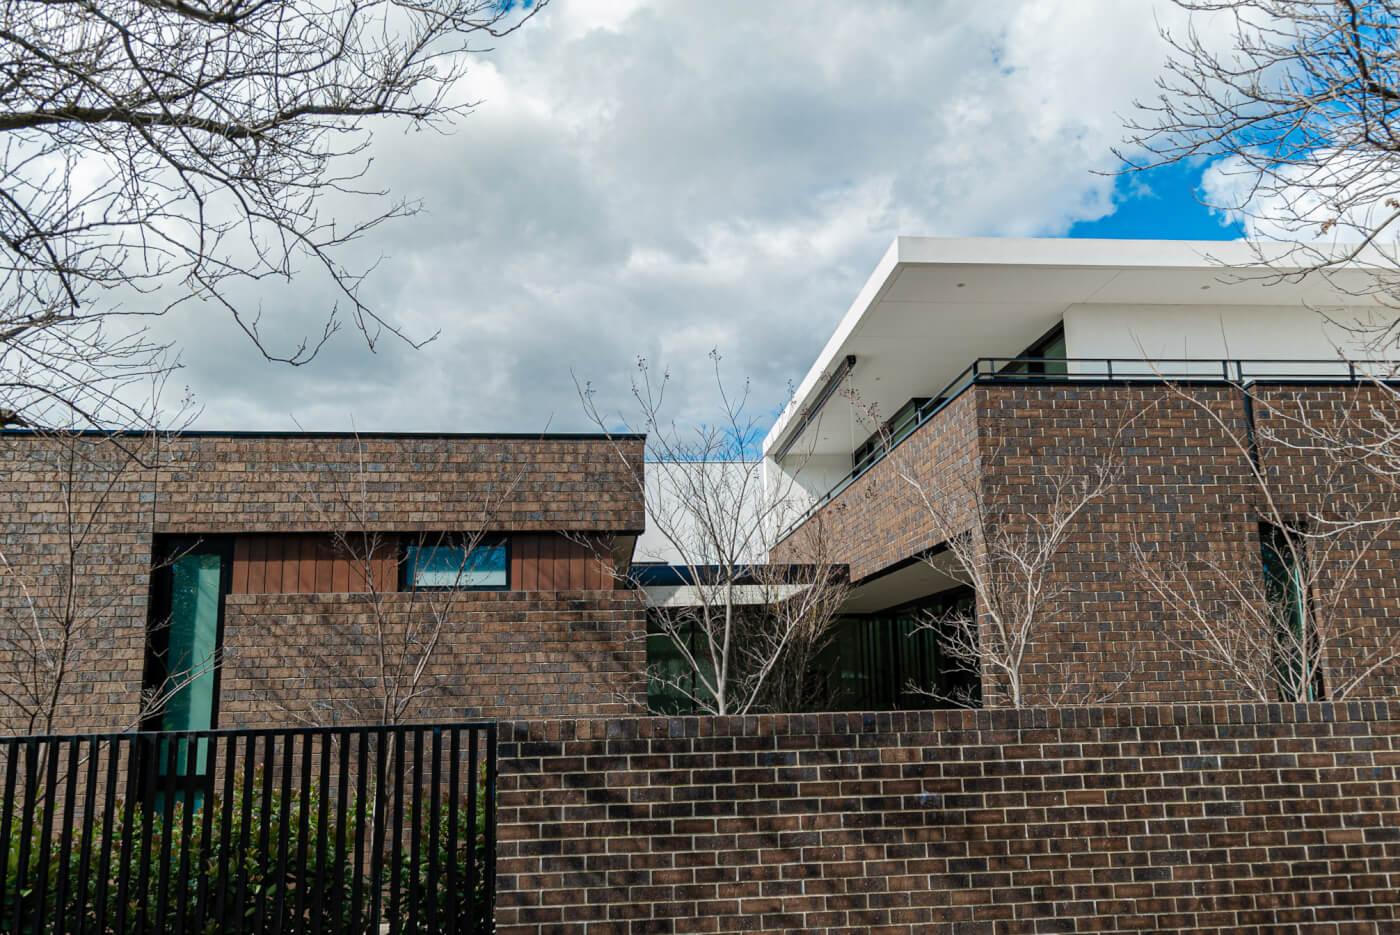 Coachhouse Brick 76mm Hyde Park Littlehampon Bricks And Pavers Reduced 18